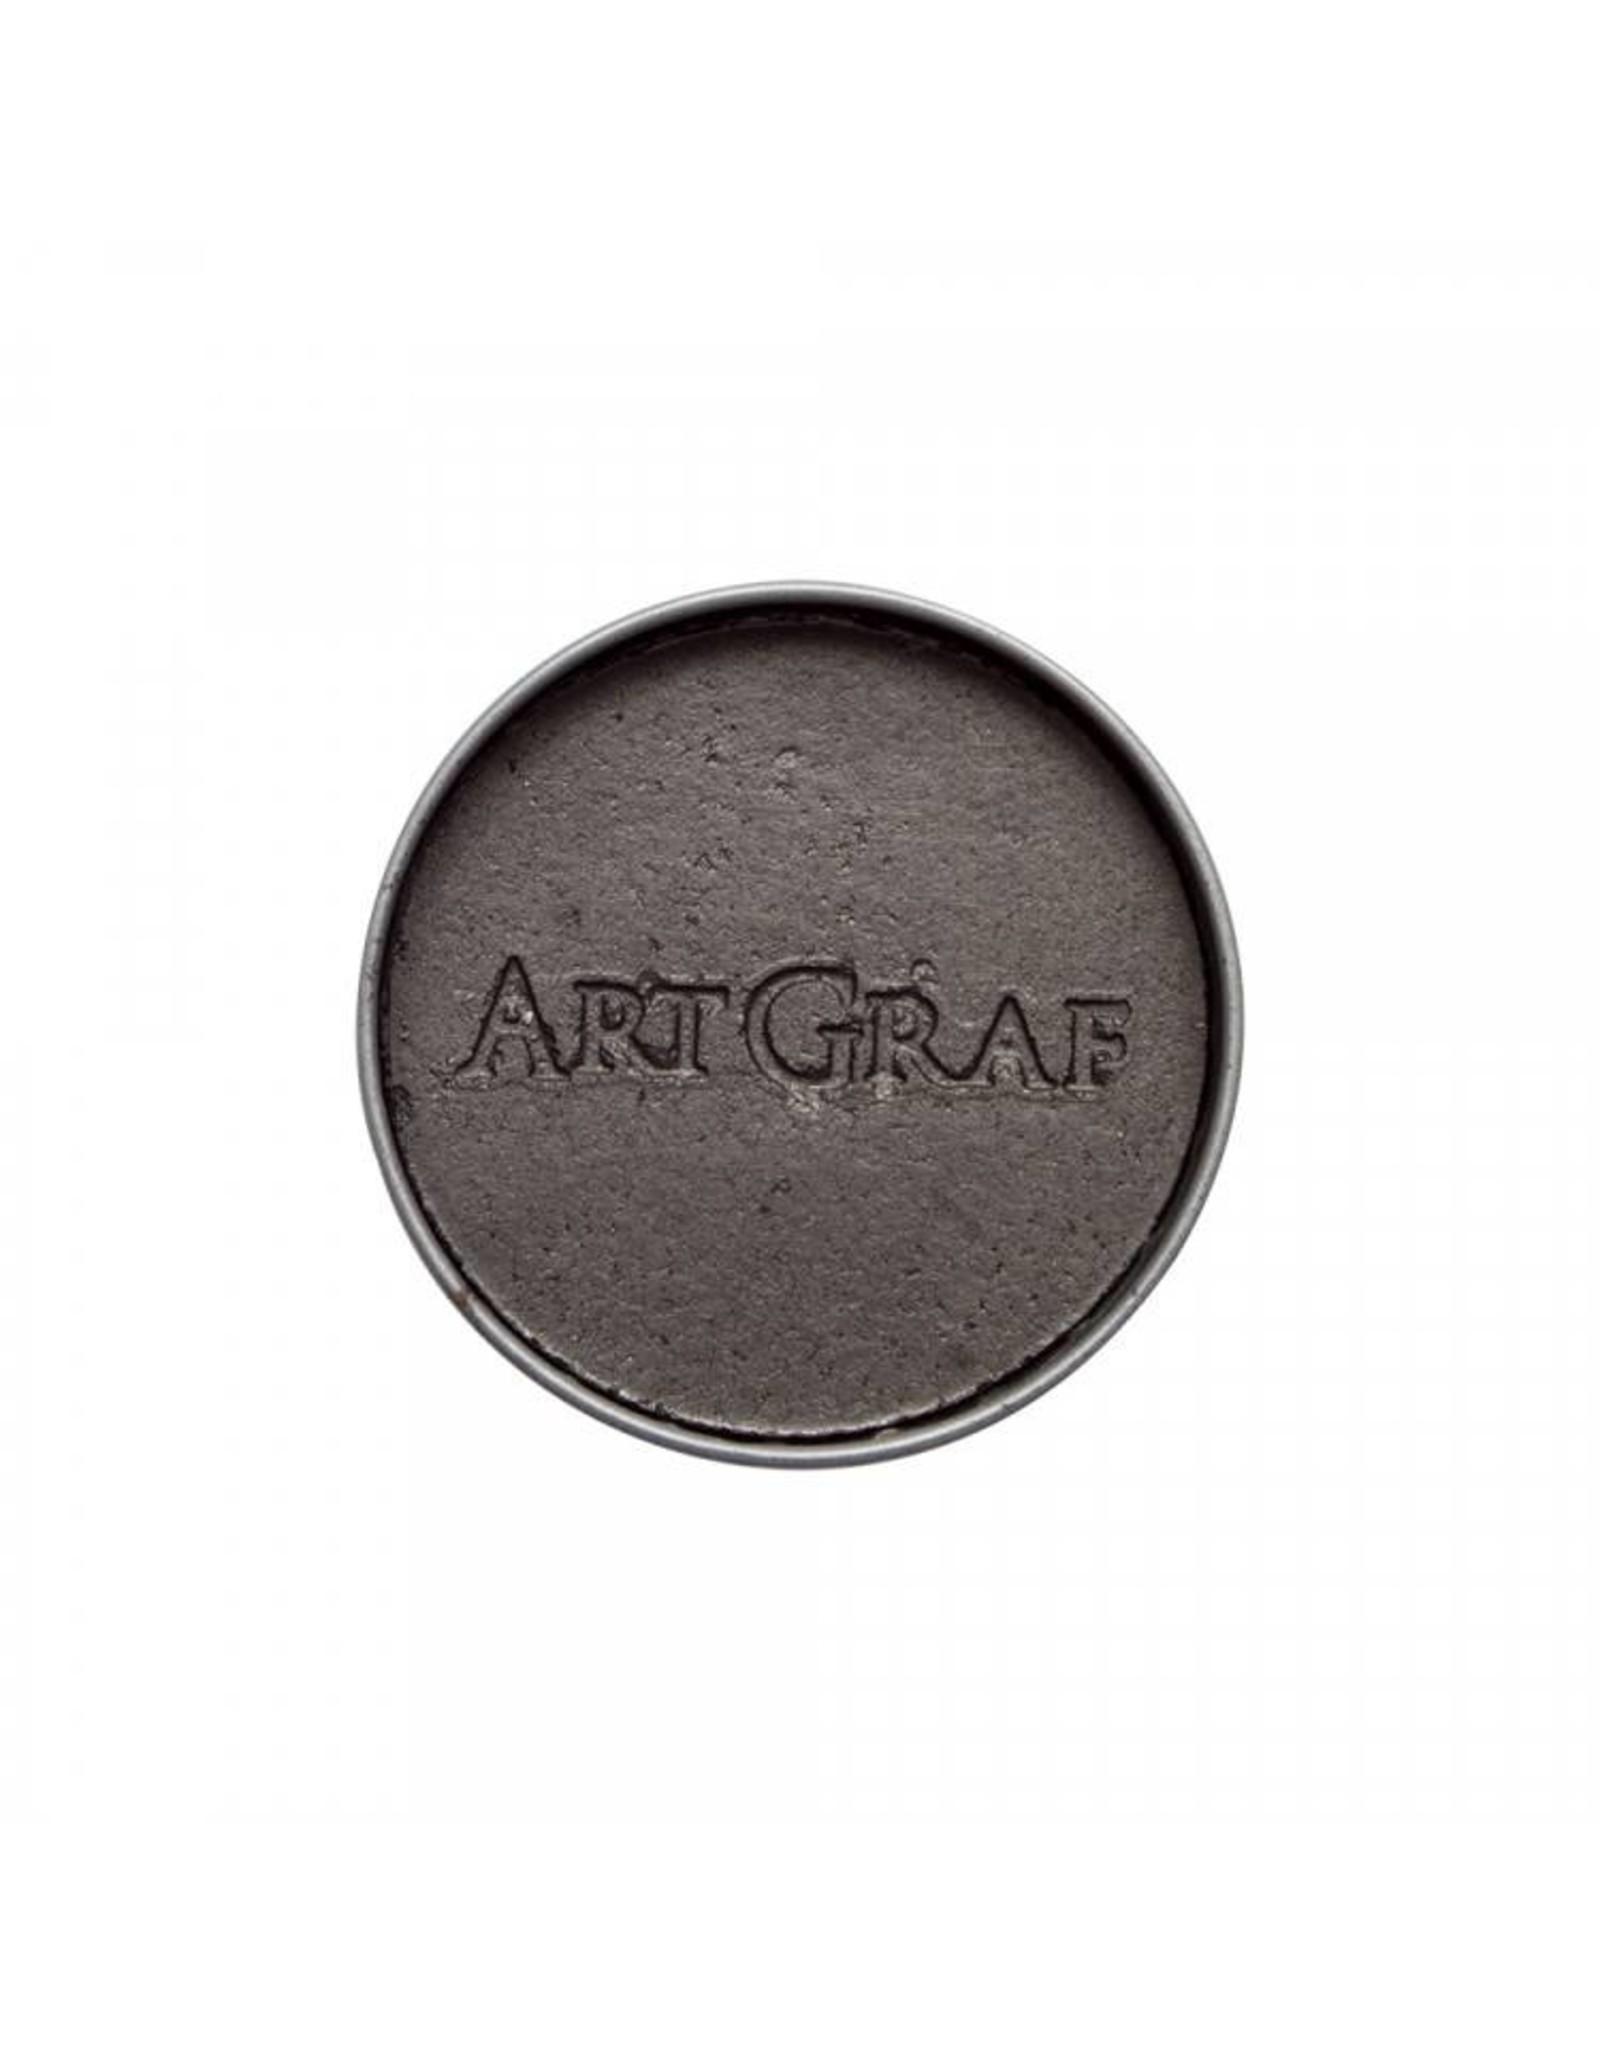 Viarco ArtGraf wateroplosbaar grafiet